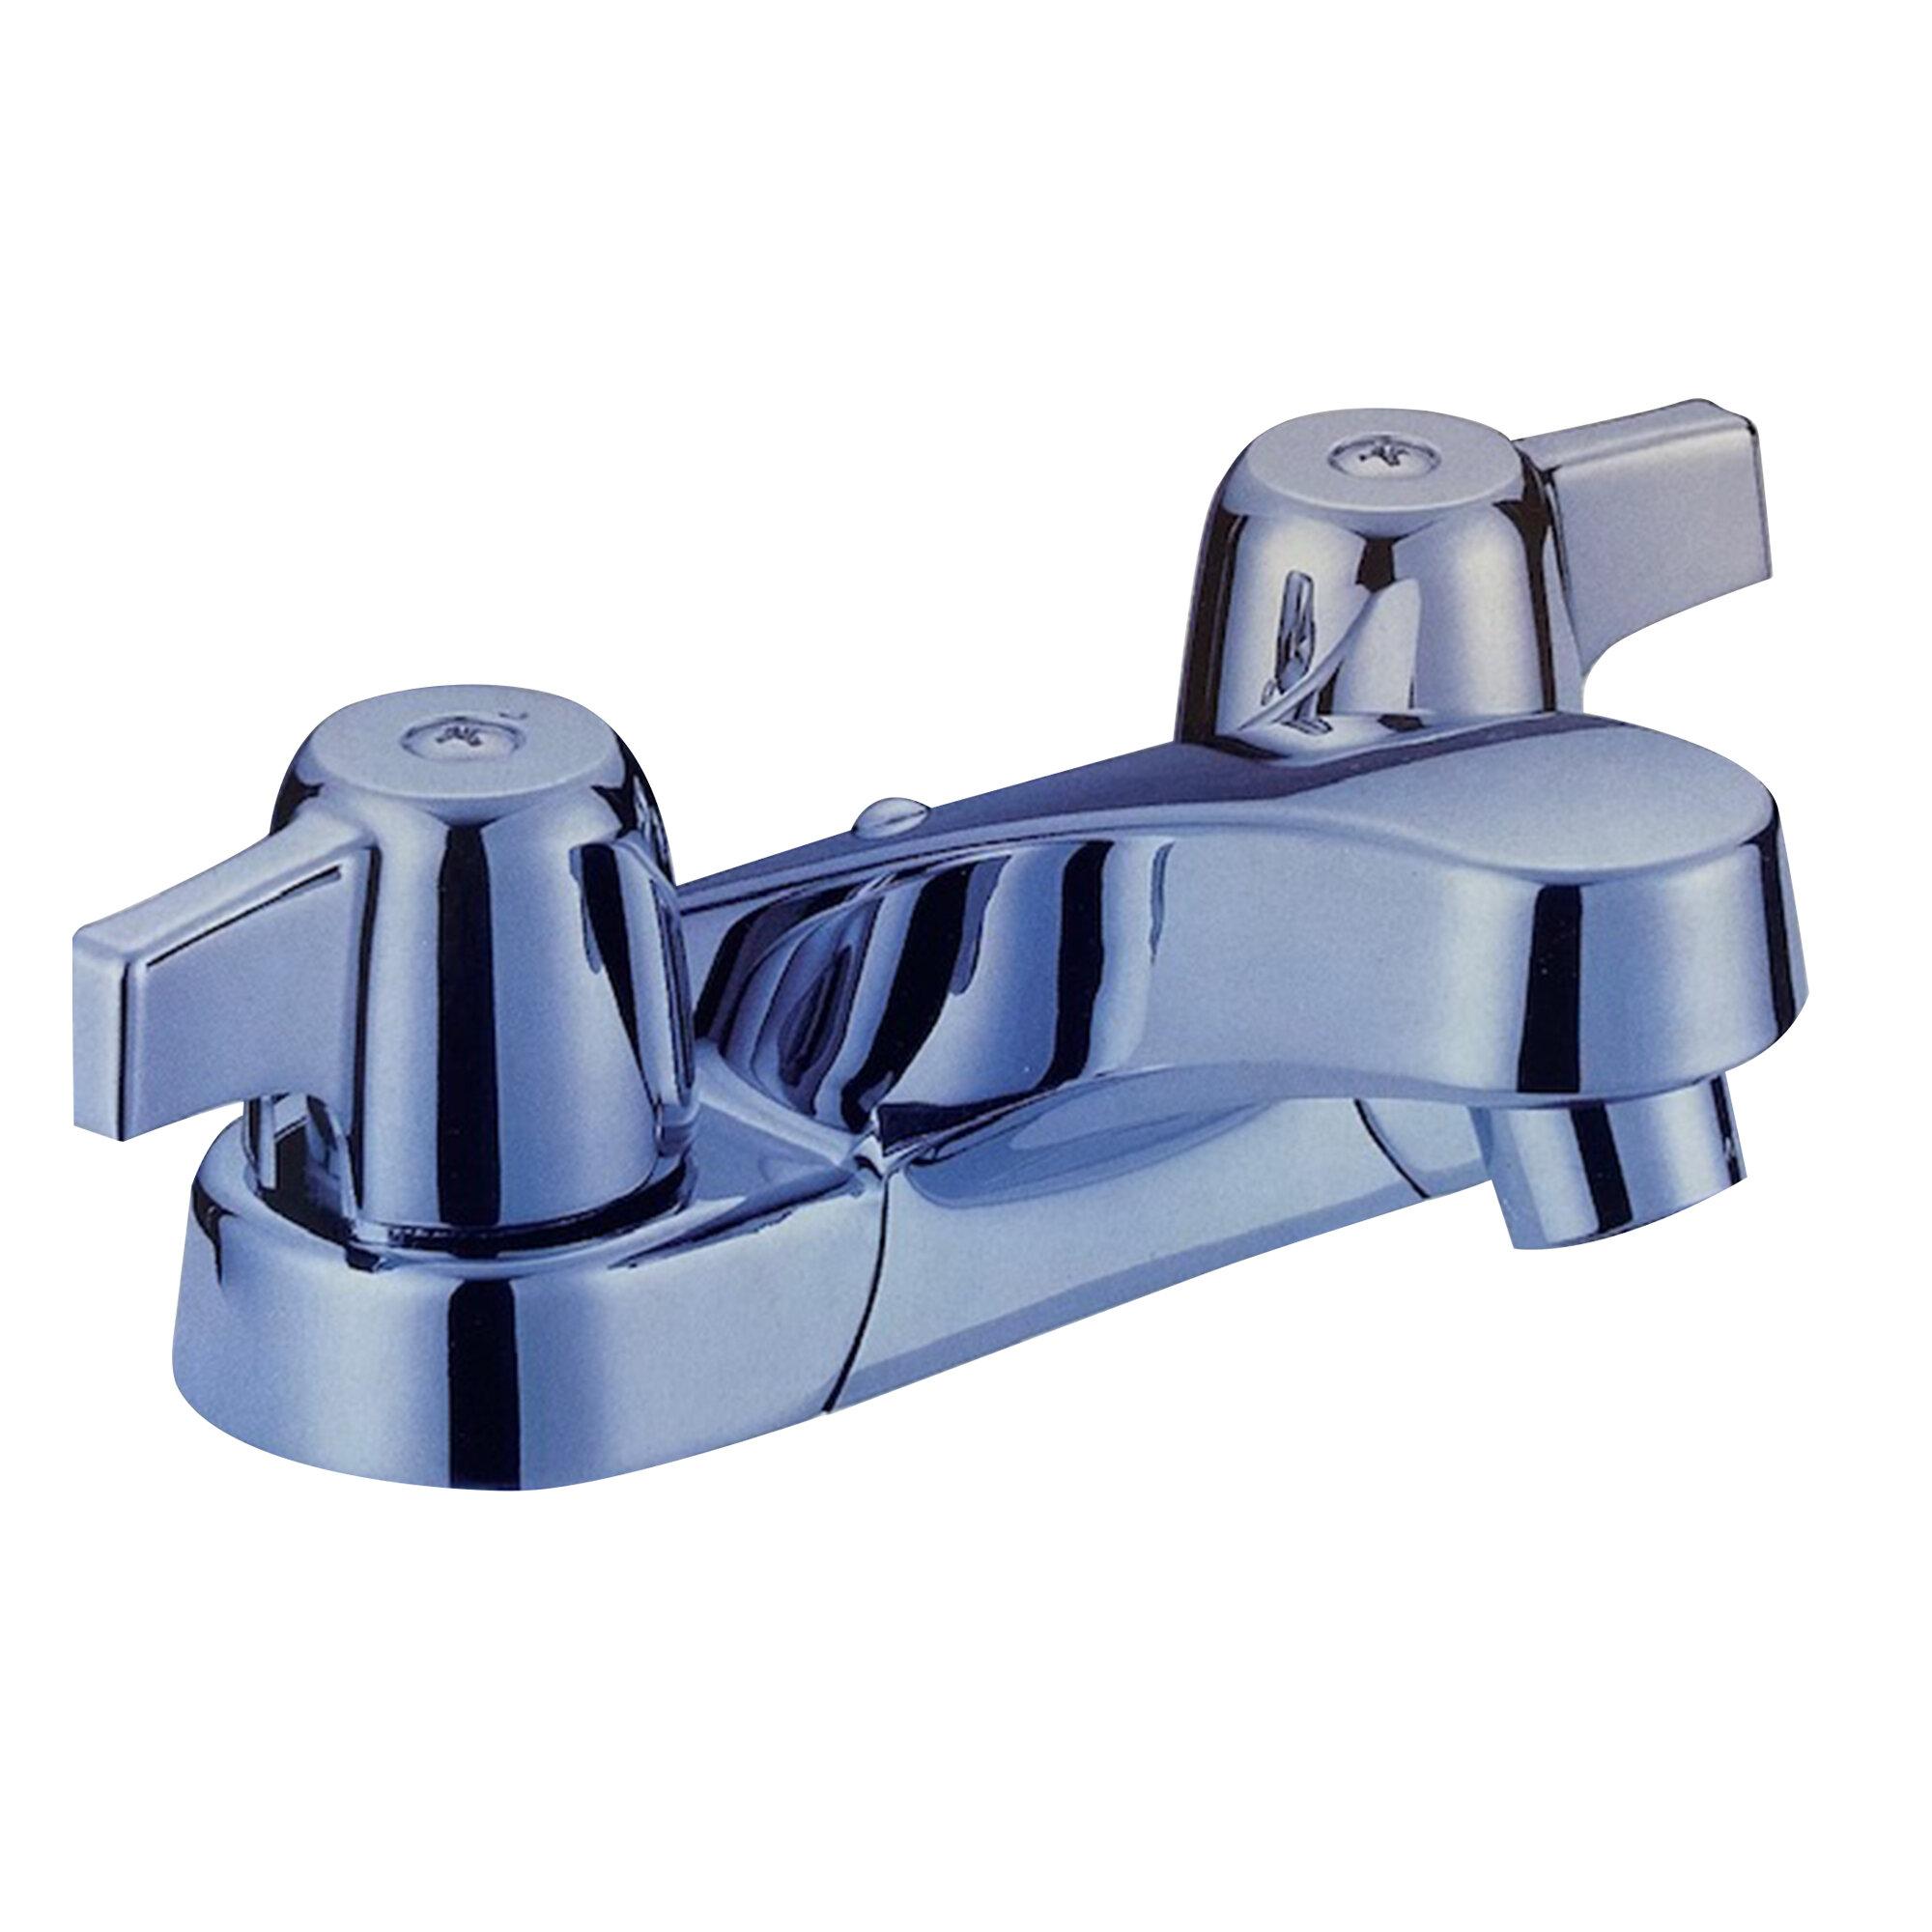 Aa Warehousing Lavatory Centerset Bathroom Faucet With Drain Assembly Wayfair